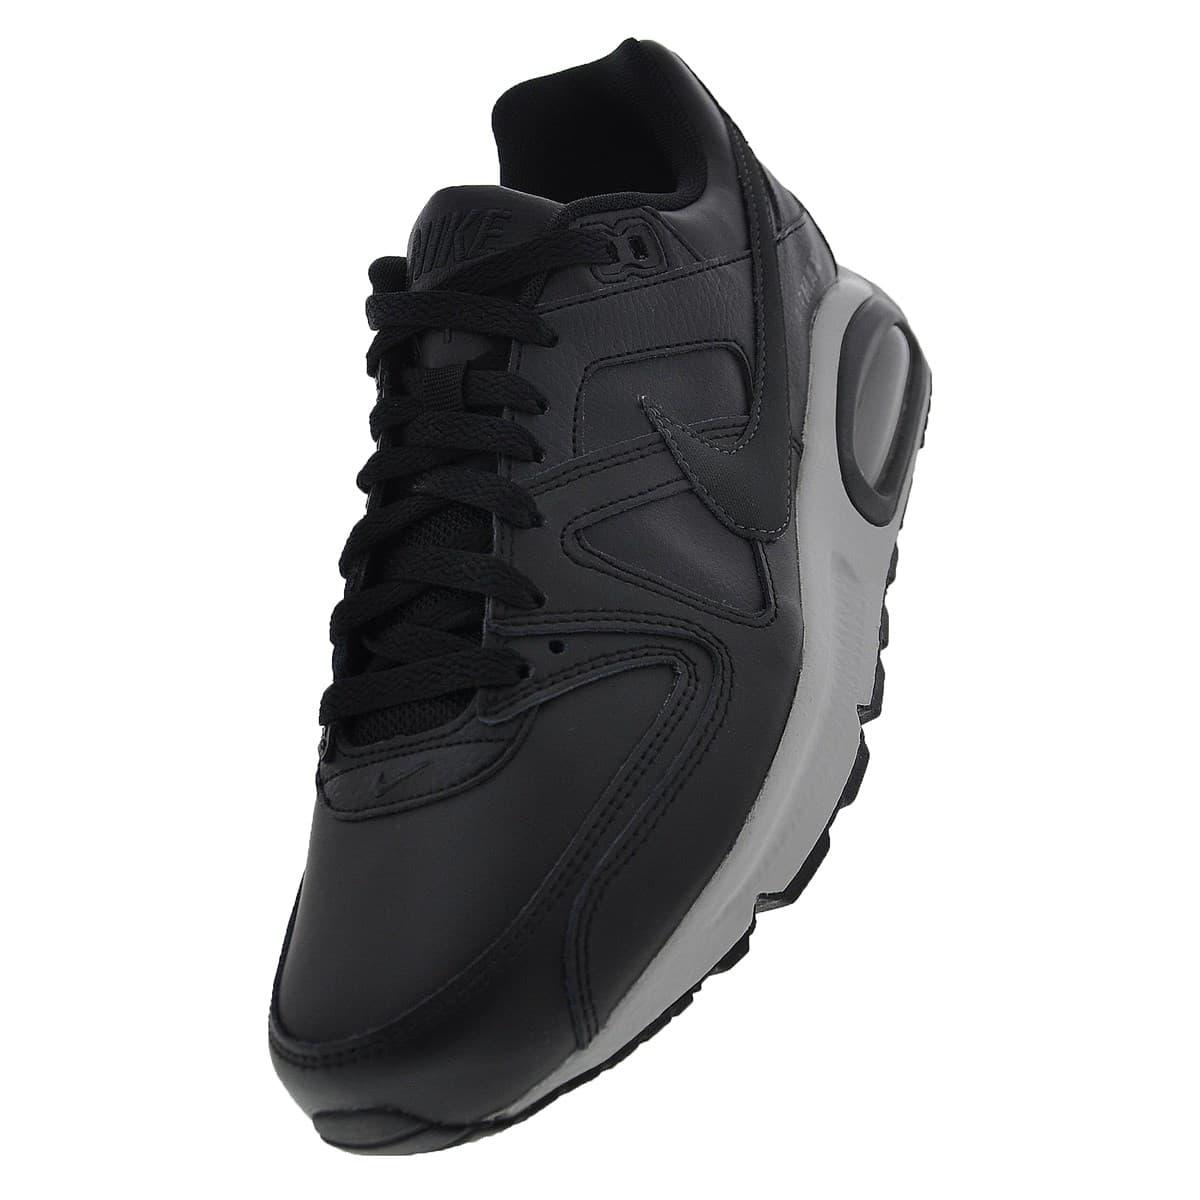 Air Max Command Leather Erkek Siyah Ayakkabı